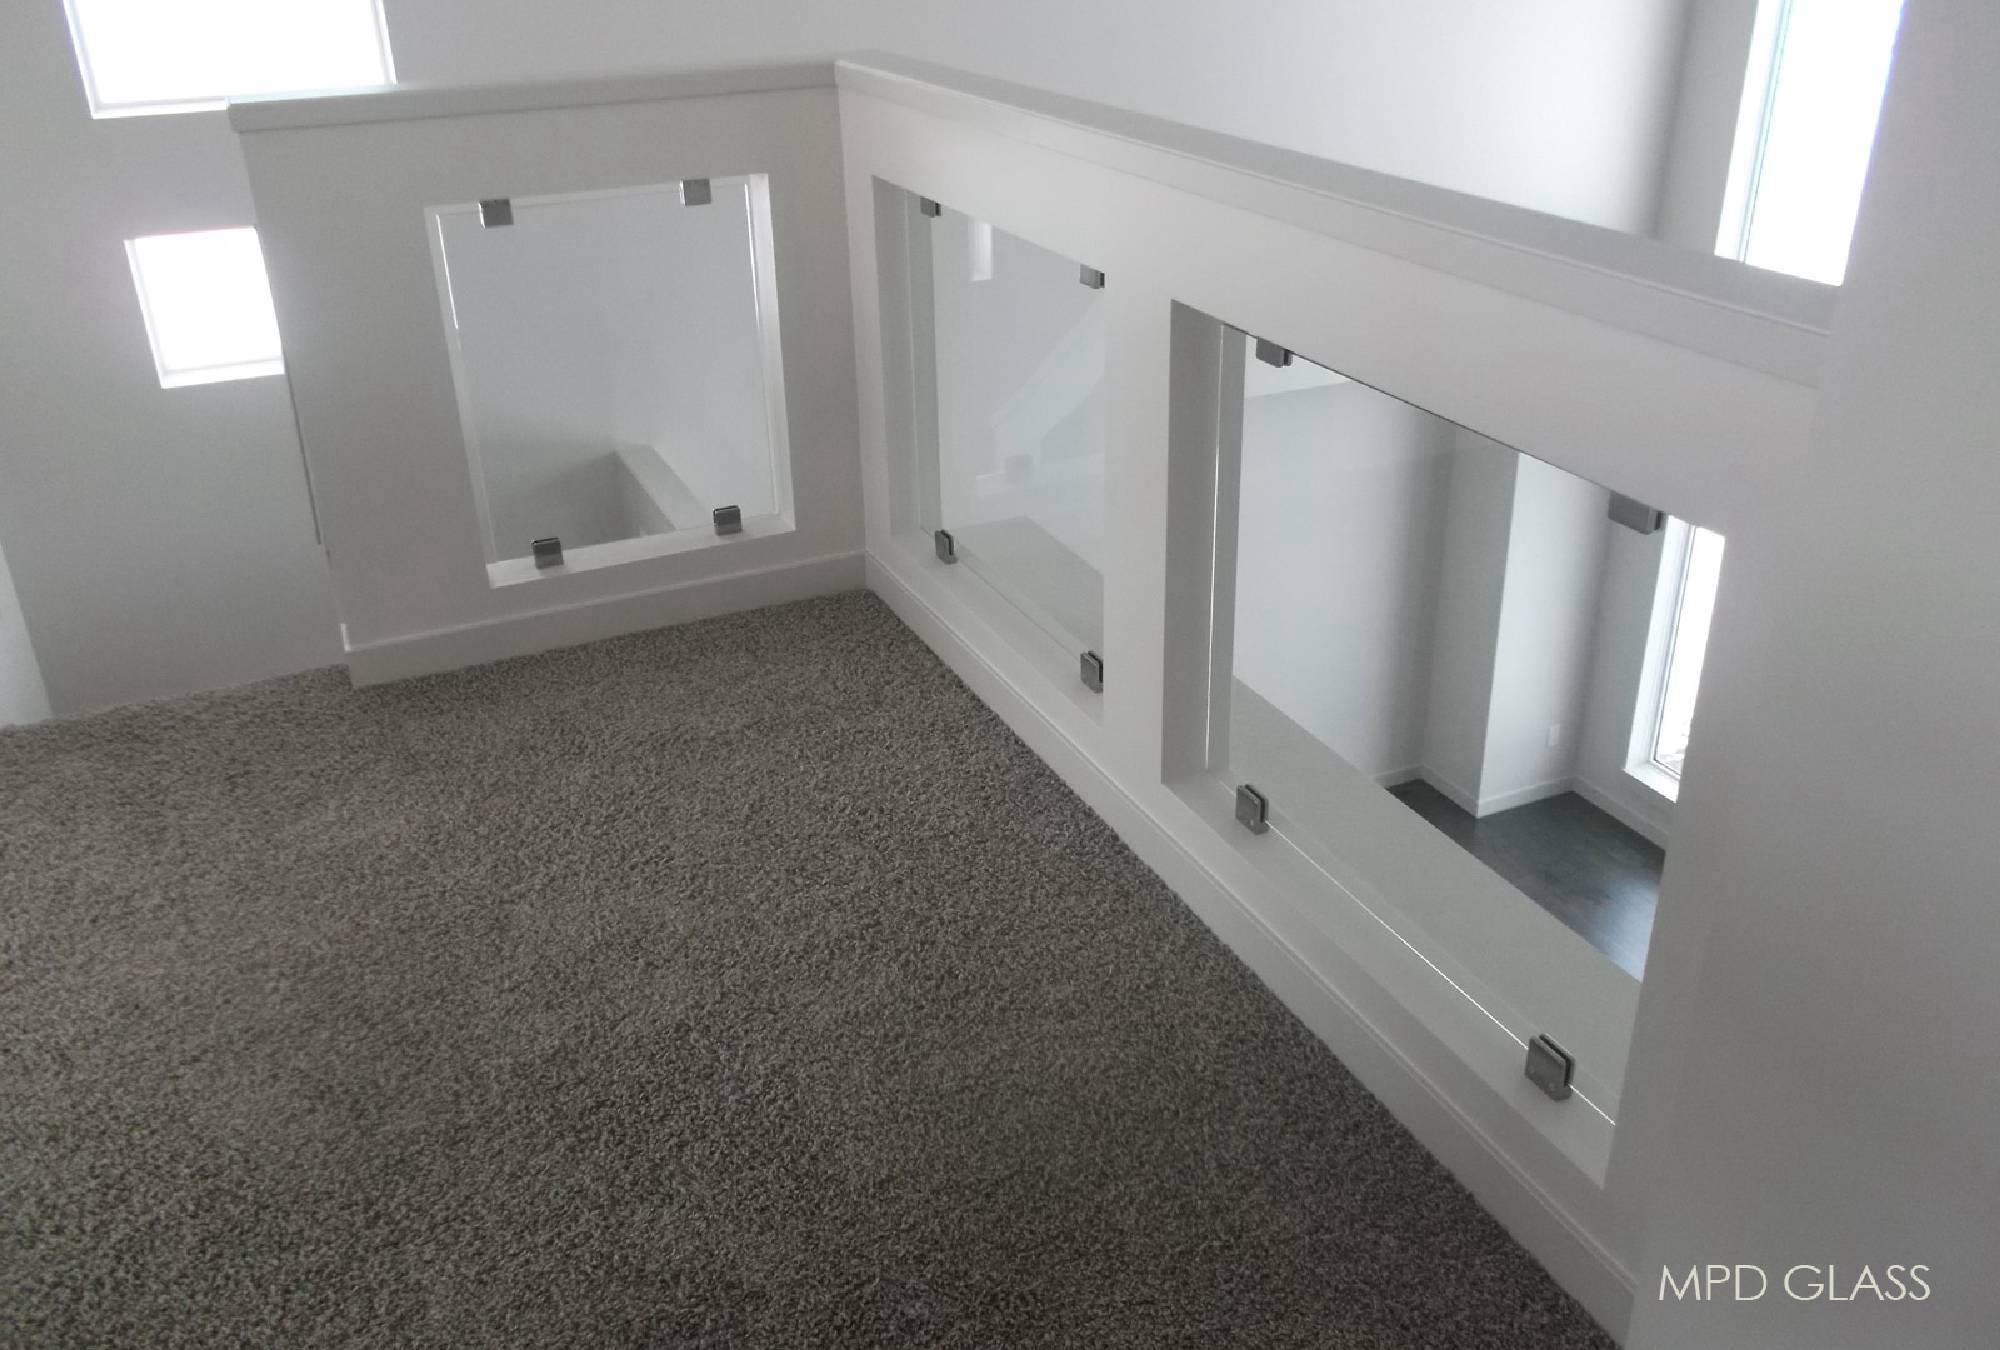 Custom Glass Railings Stainless Steel Standoffs